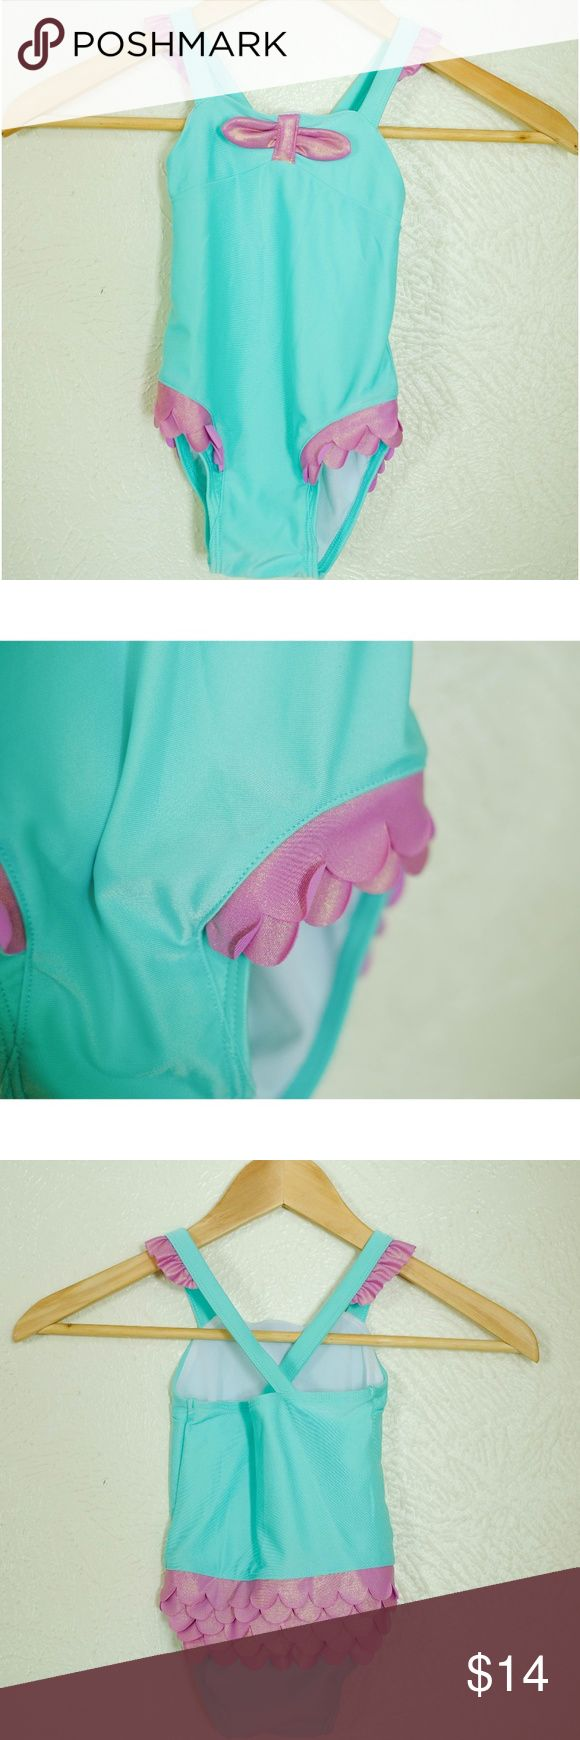 Mermaid one piece swimsuit Cat & Jack 18 month Mermaid one piece swimsuit. Strap…